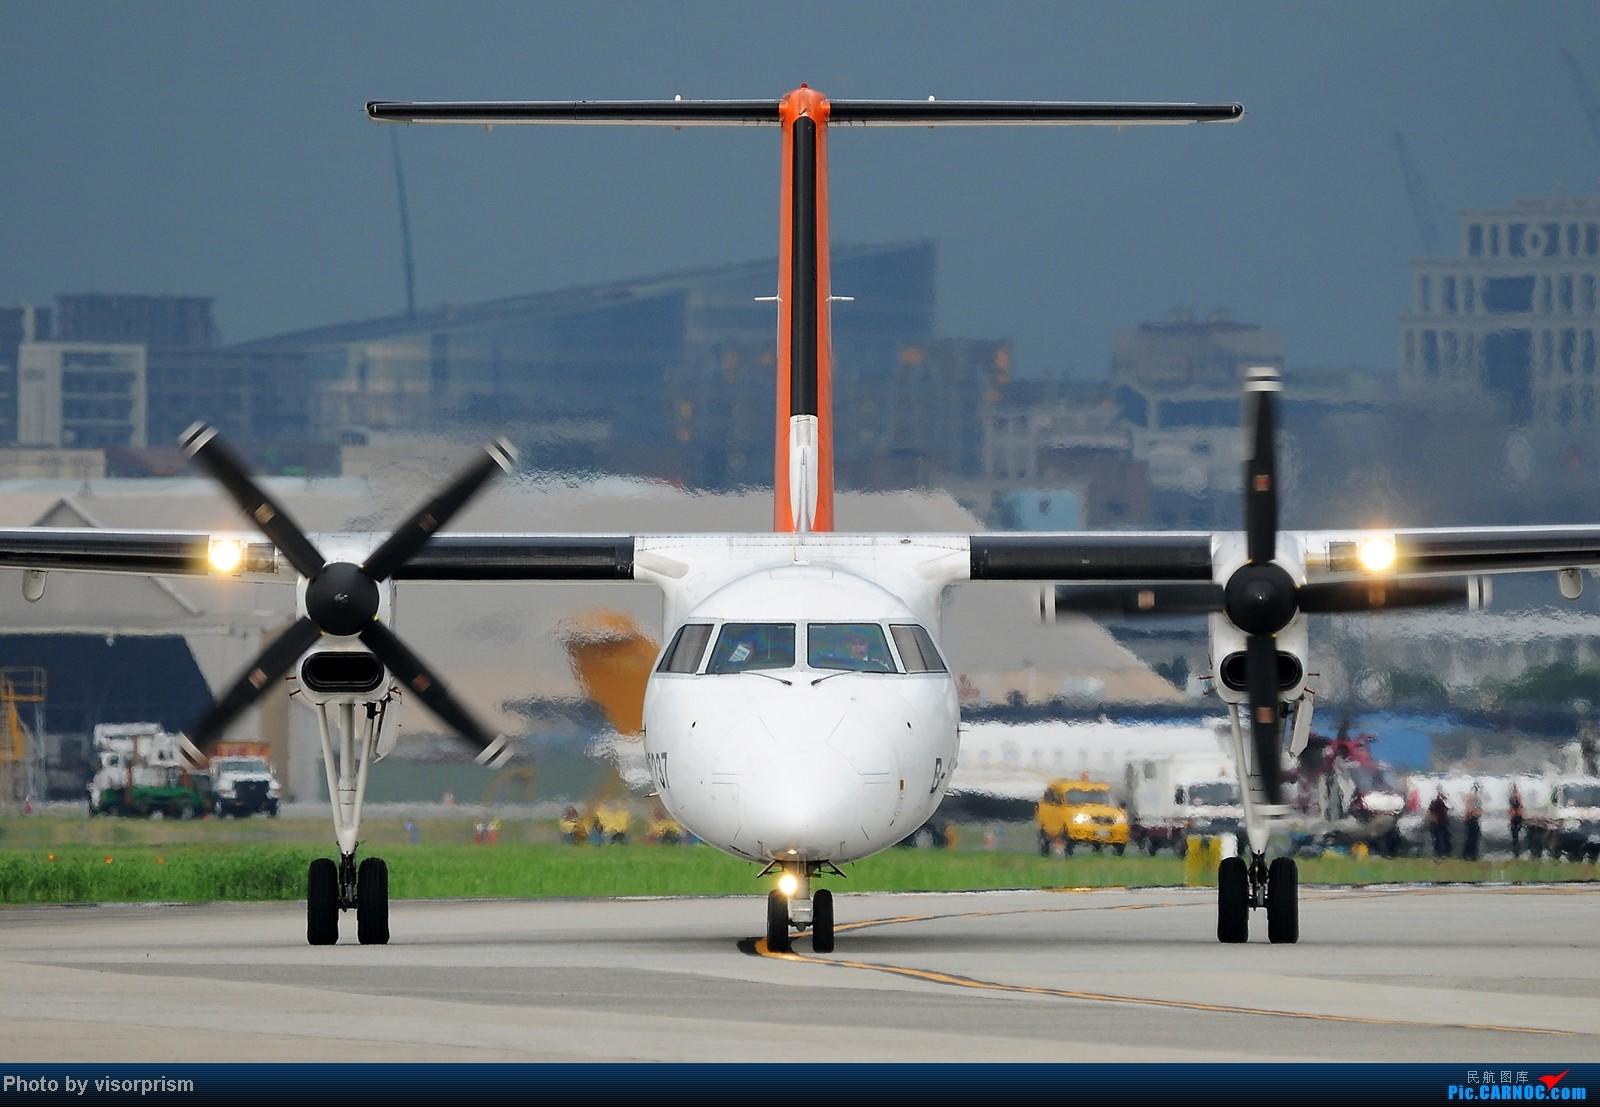 Re:[原创][台北飛友會]SIGMA APO 500mm F4.5 DG HSM 鏡頭測試 DE HAVILLAN CANADA DHC-8 B-15237 中国台北松山机场